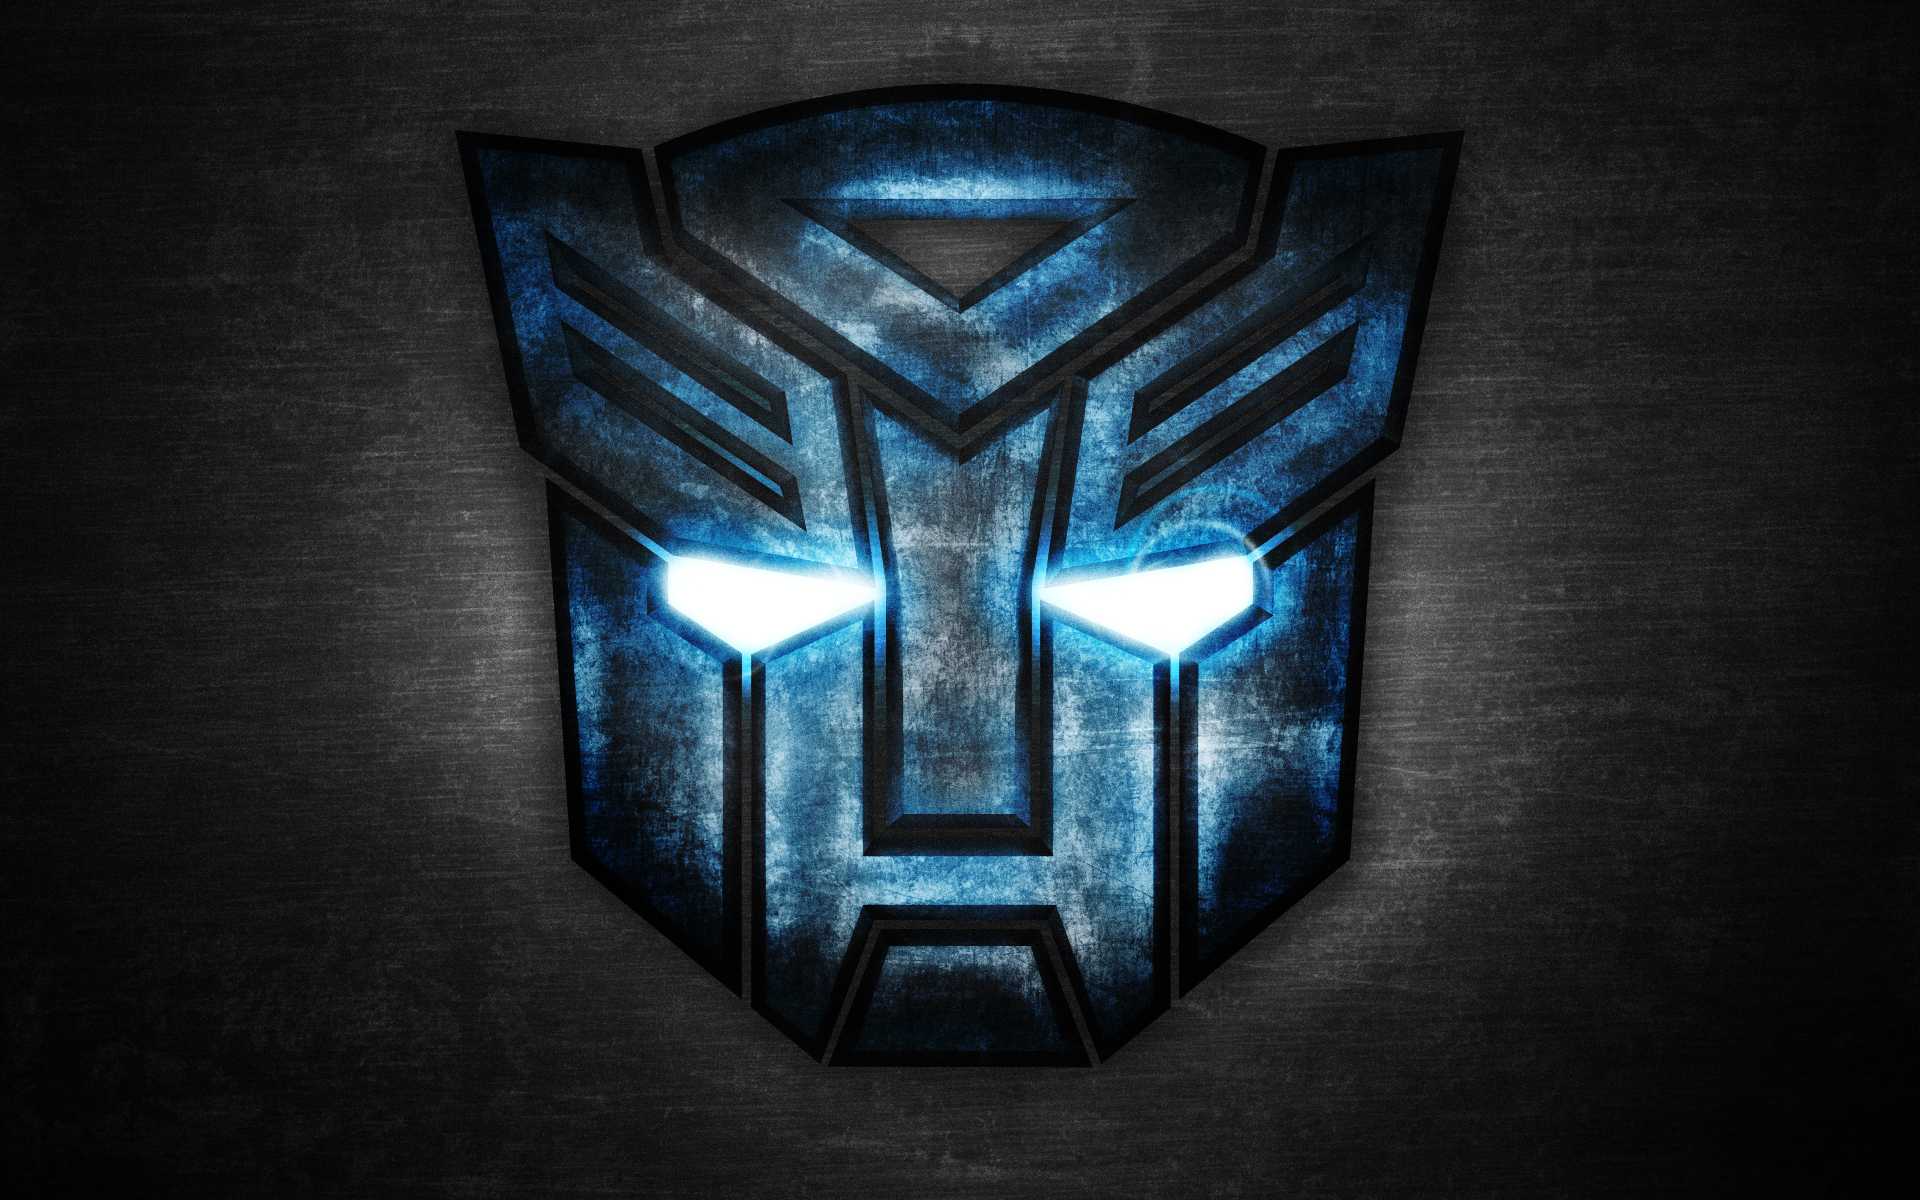 Transformers wallpaper 1920x1200 4   hebusorg   High Definition 1920x1200